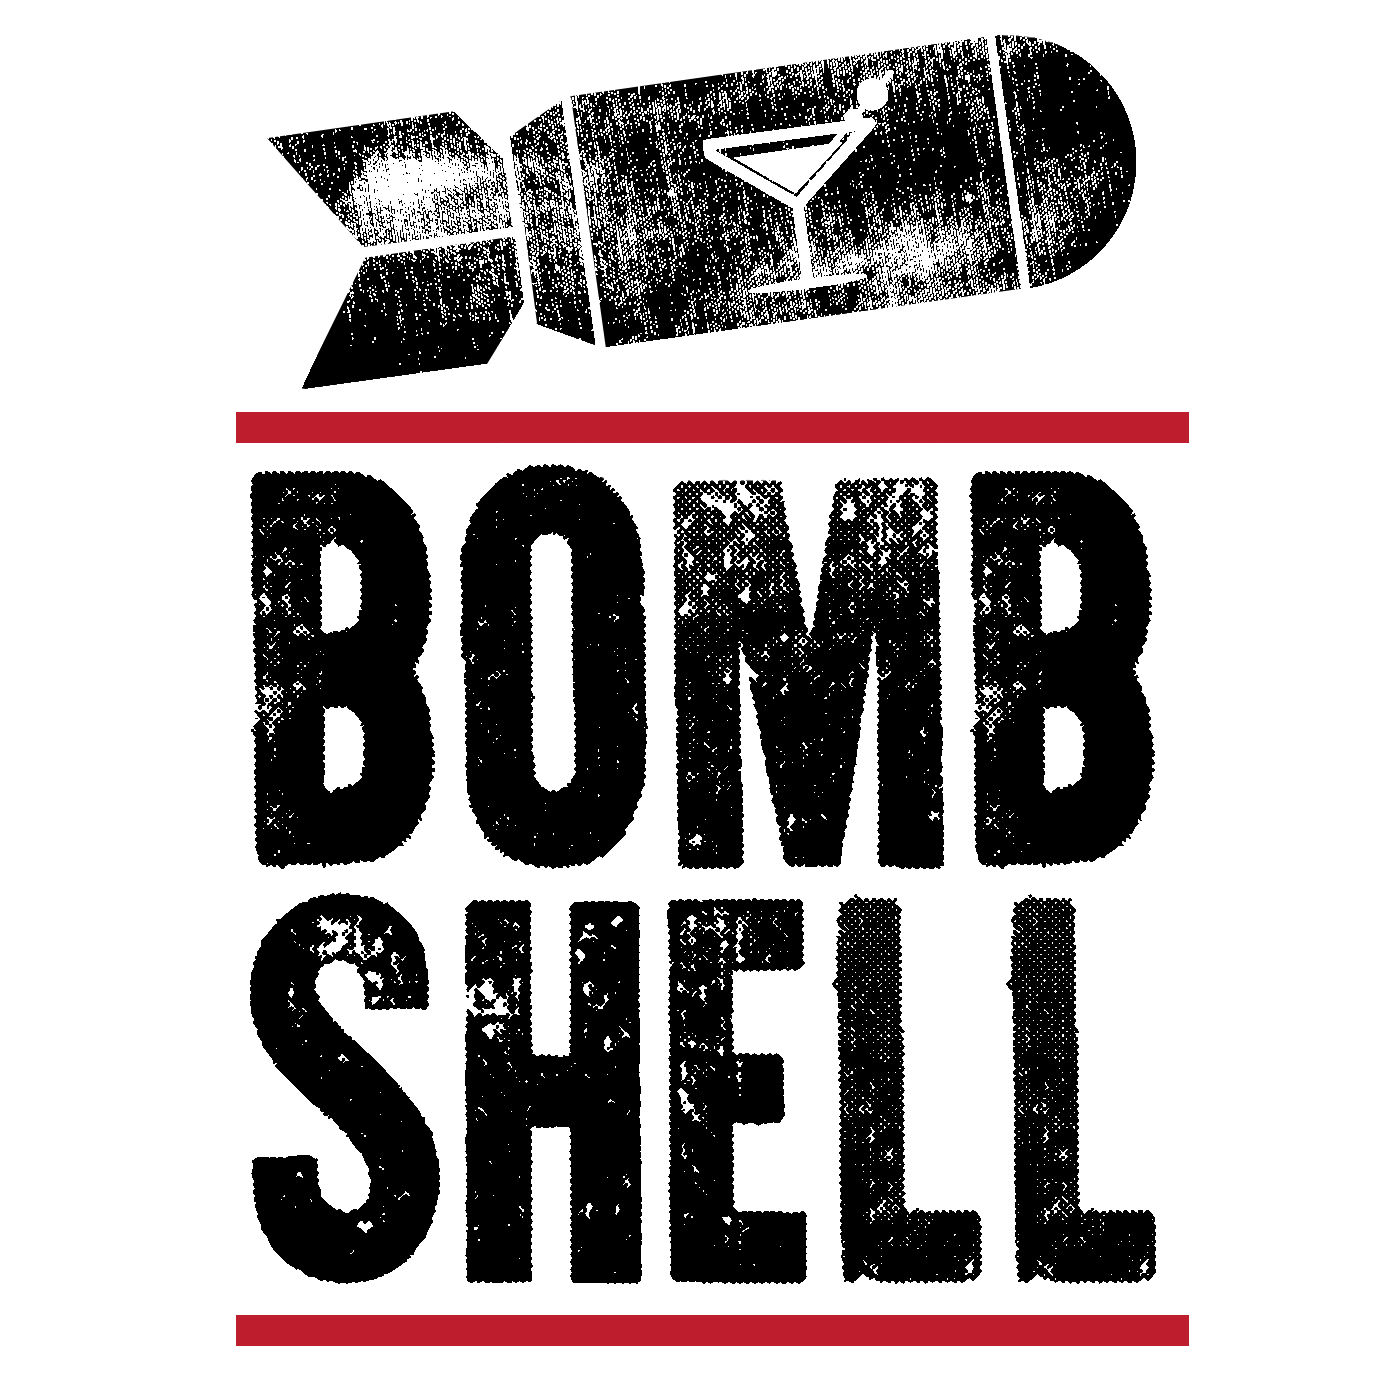 Bombshell show art